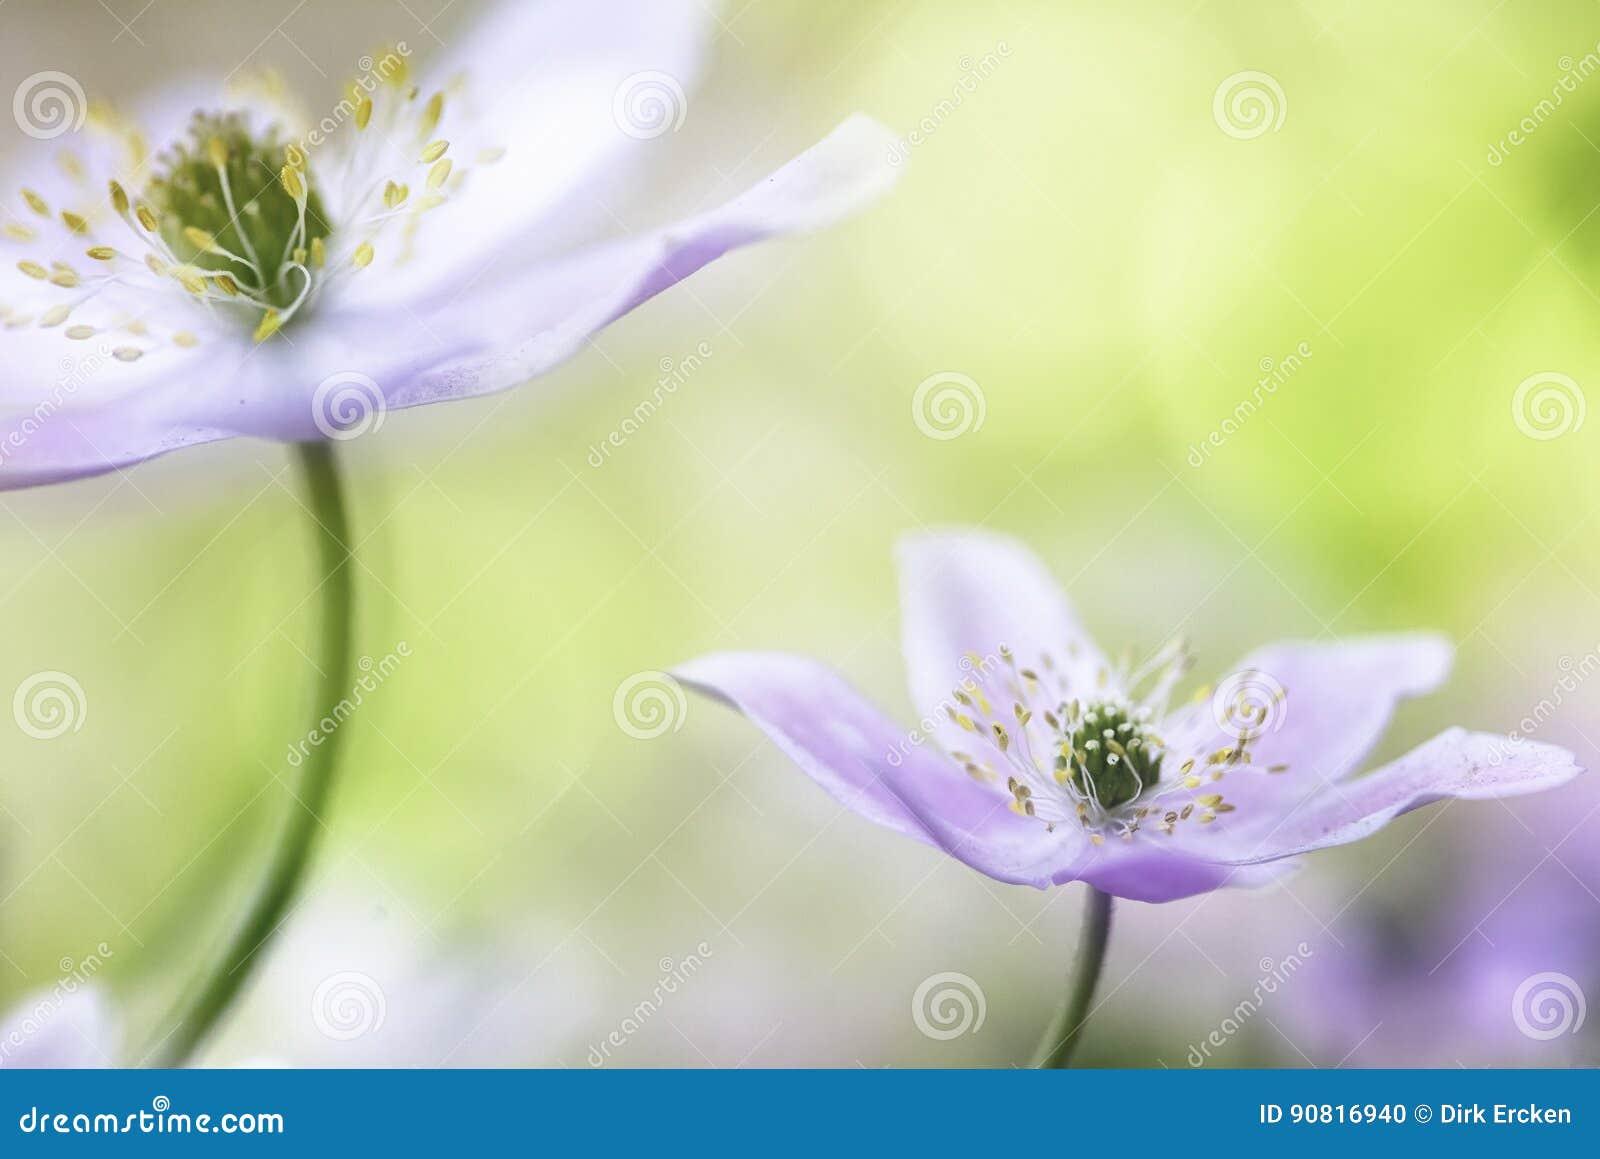 Wood anemone fantasy